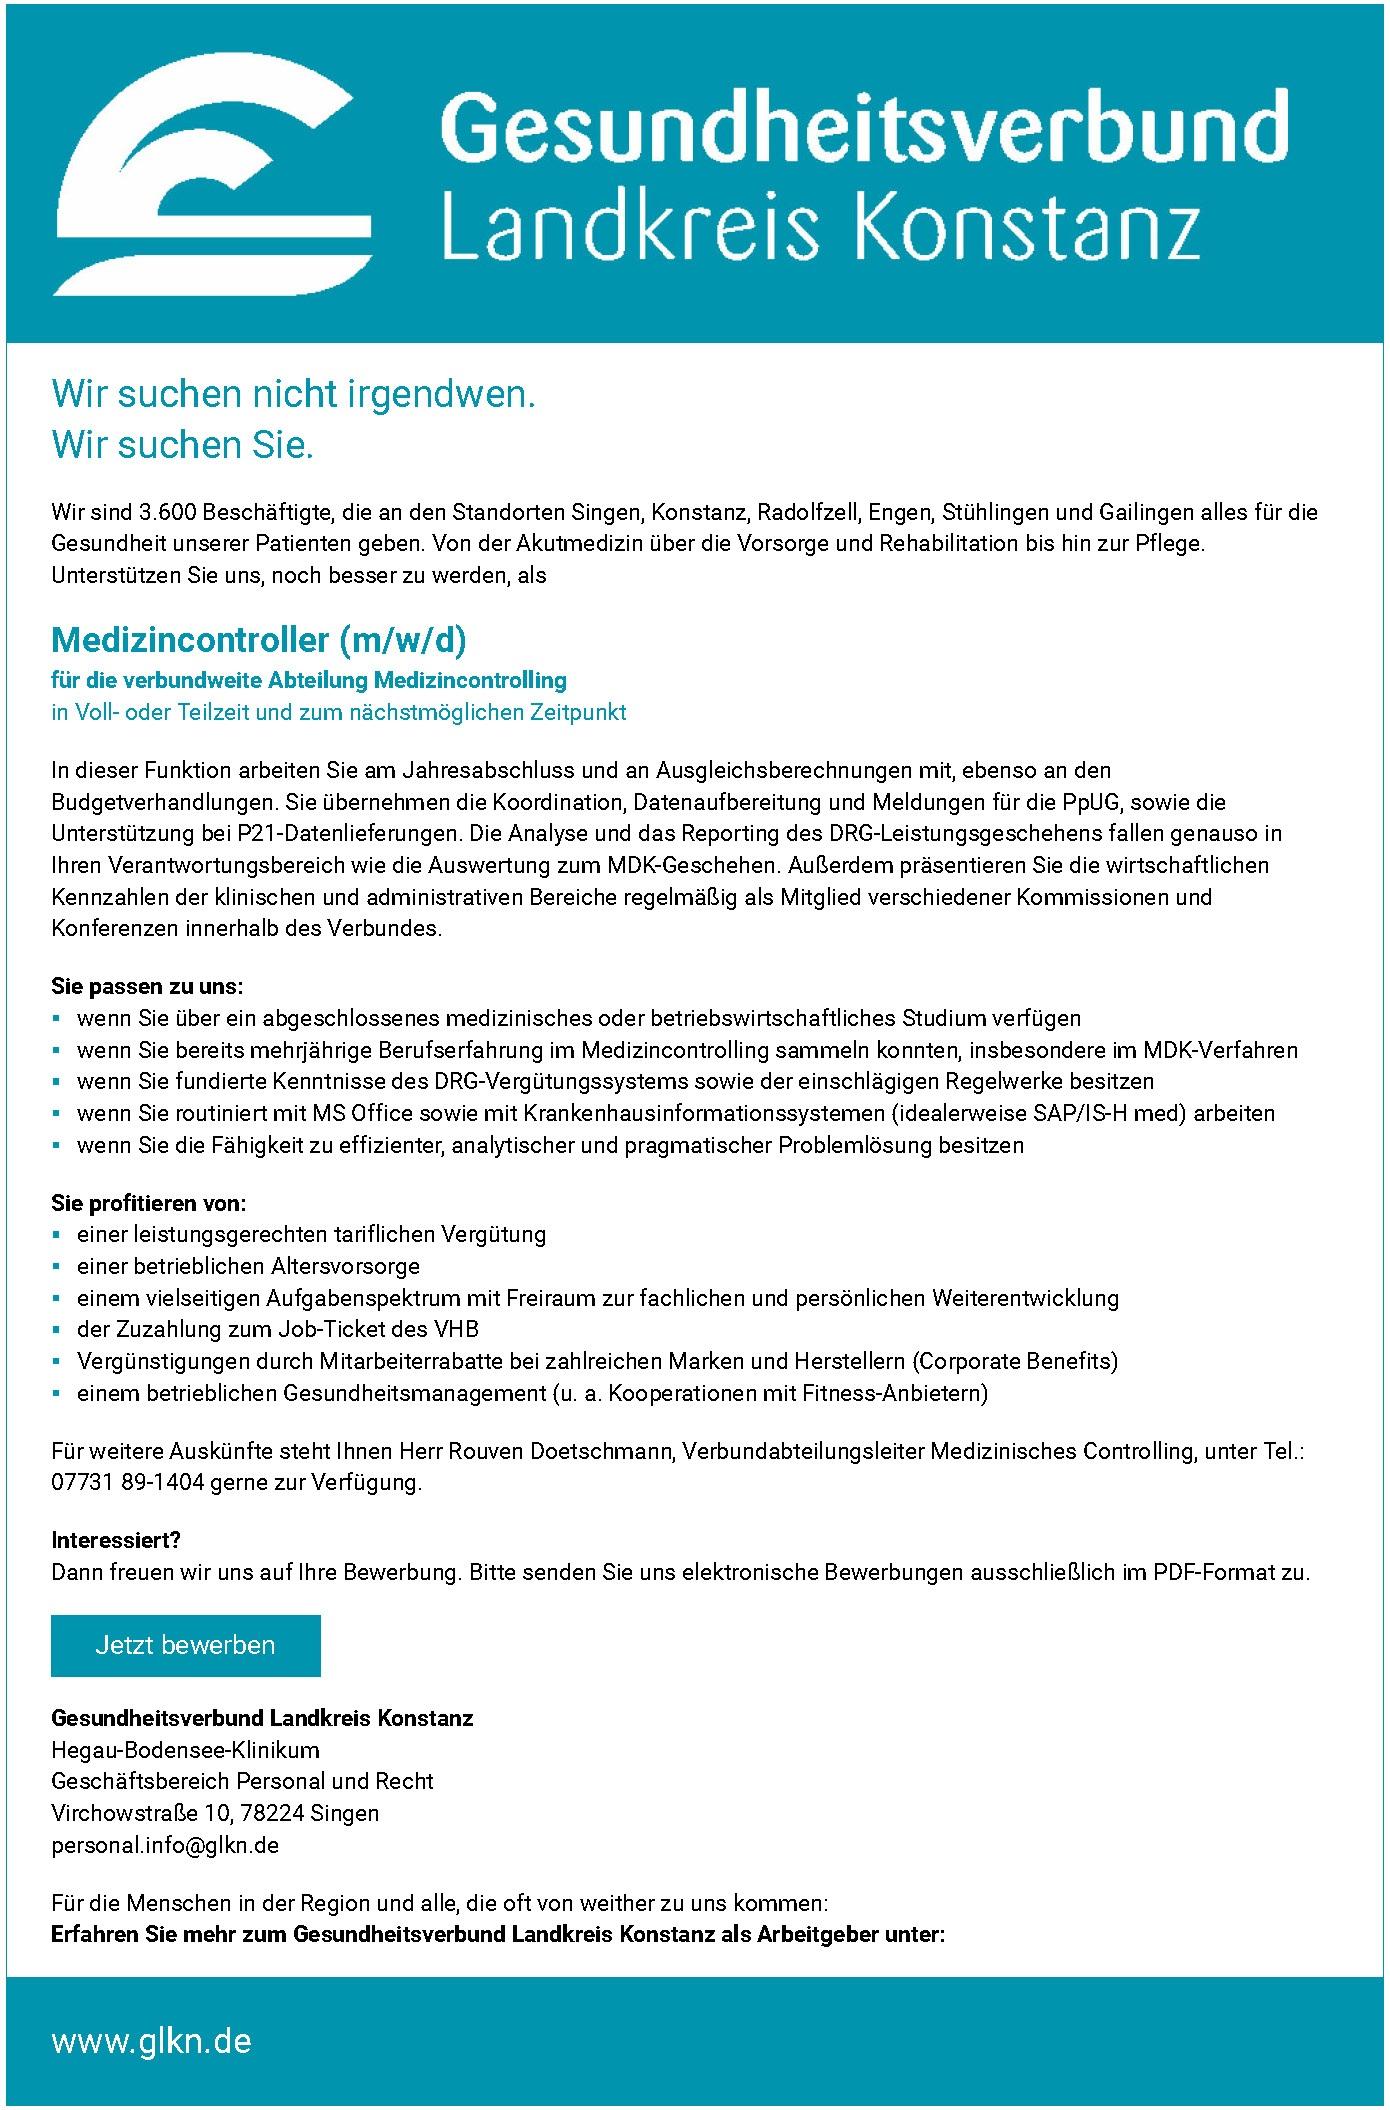 Medizincontroller (m/w/d)